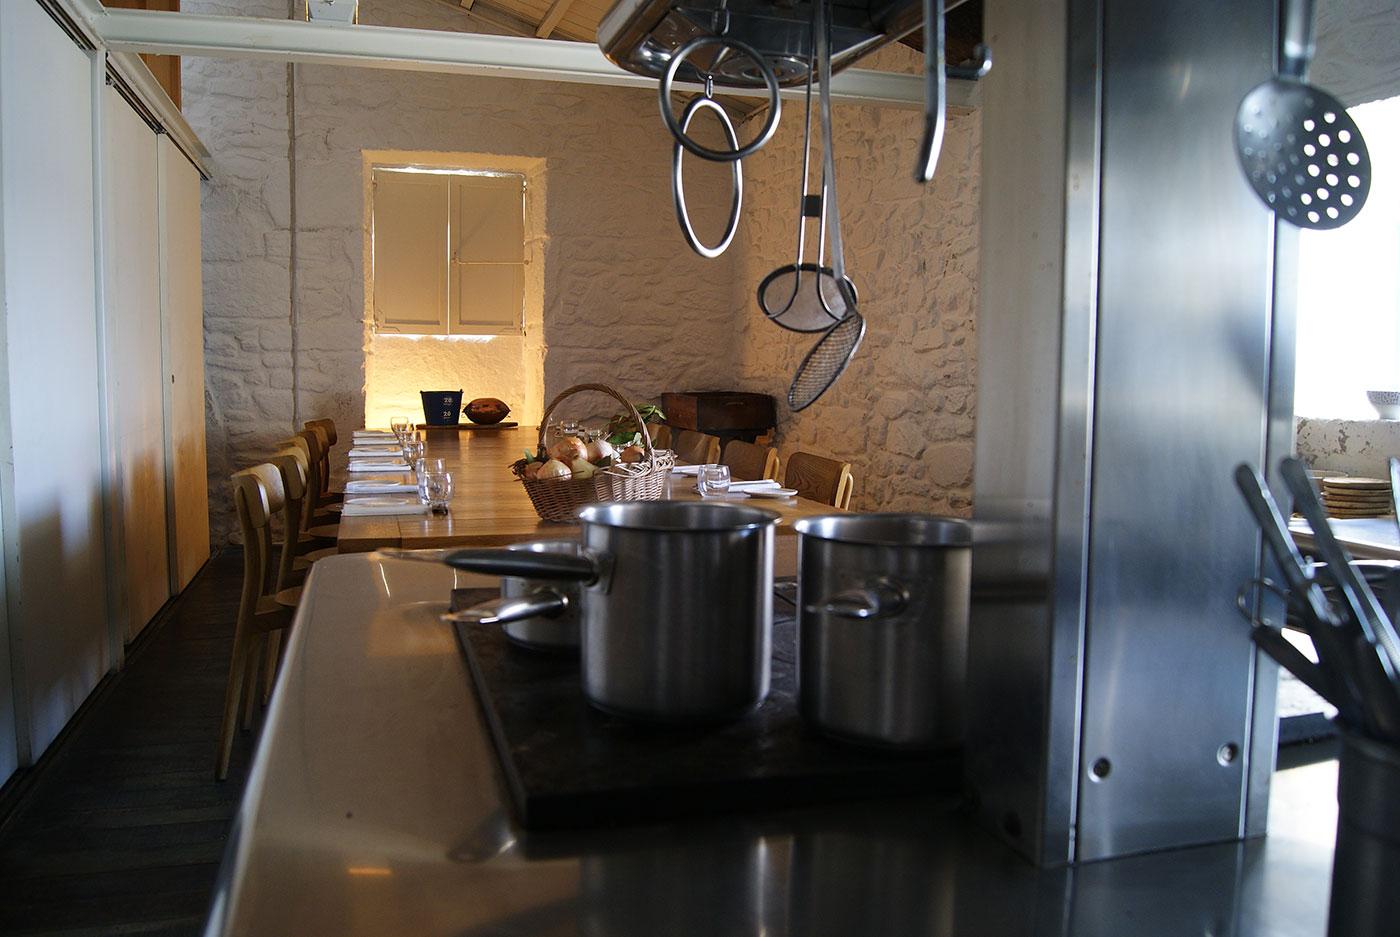 loxe-mareiro-abastos2.0-elfotogastro-fotografia-de-comida-cocina